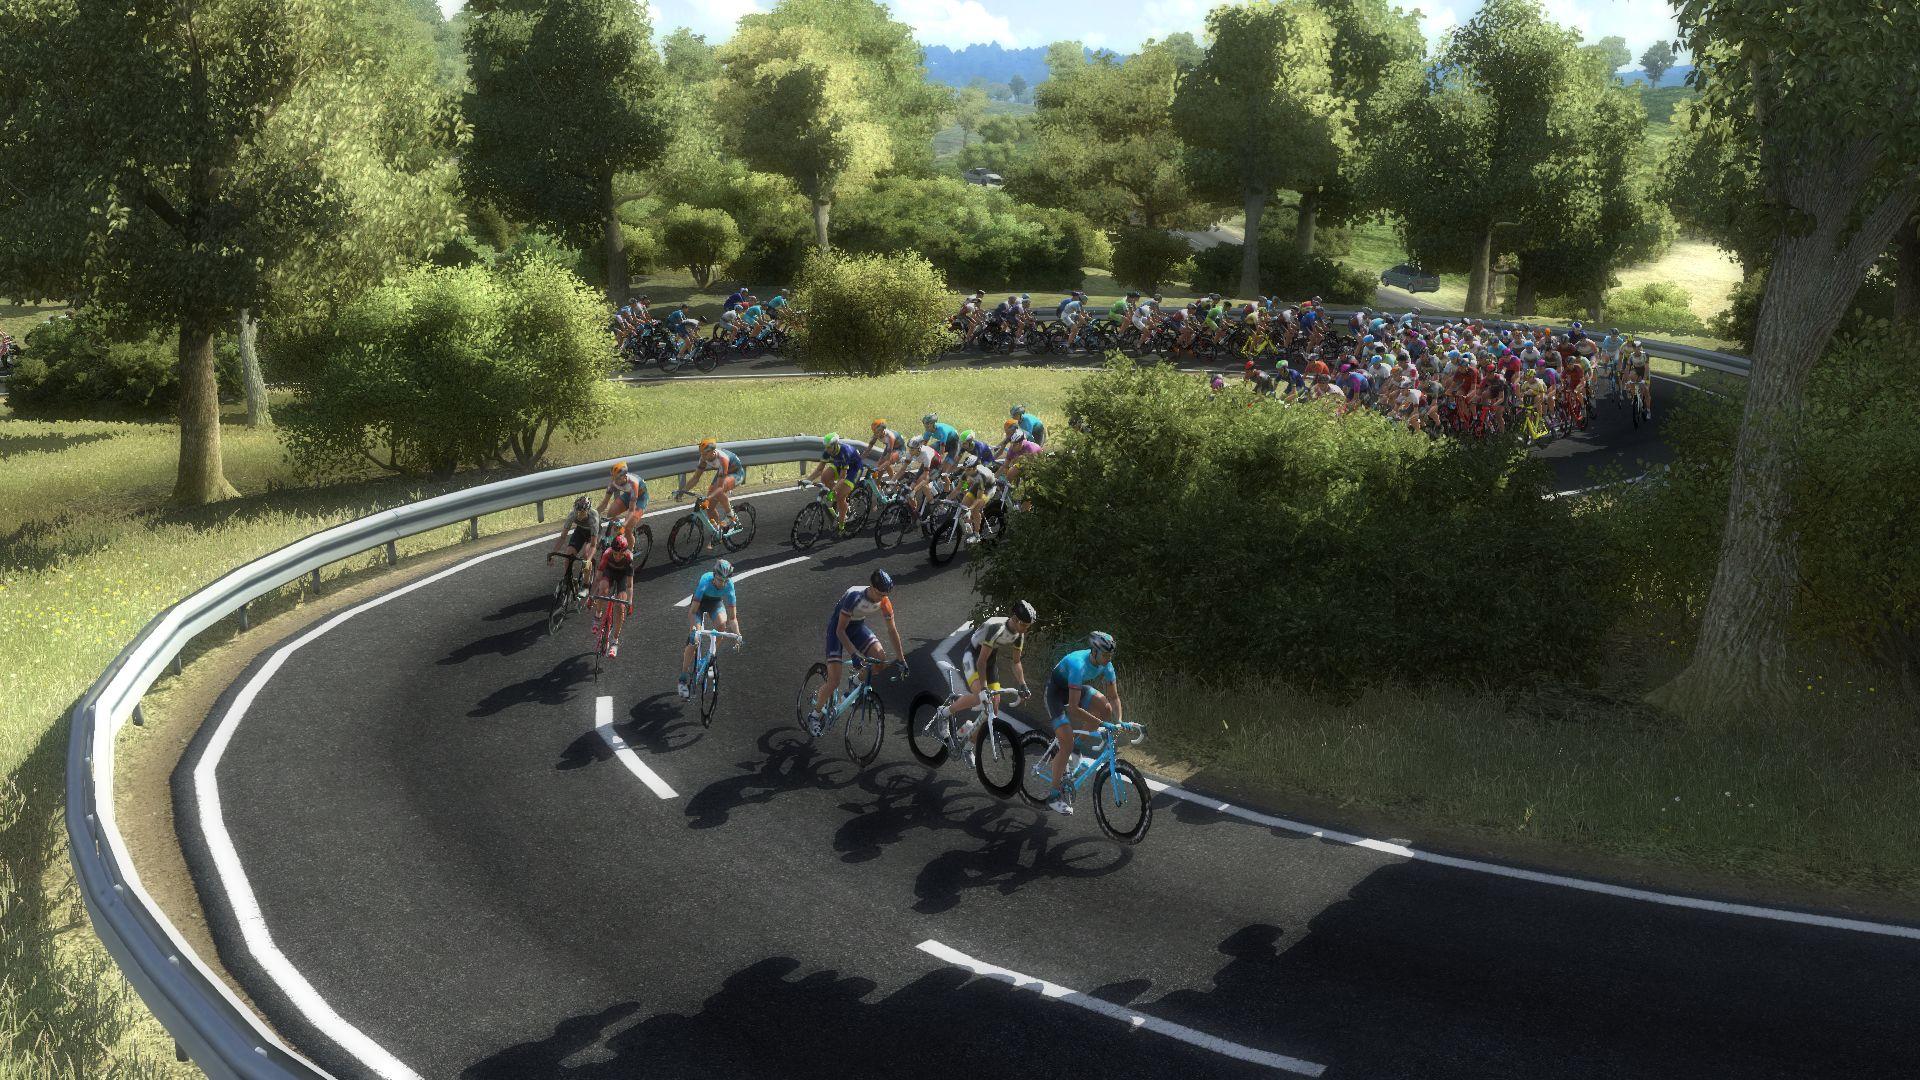 pcmdaily.com/images/mg/2020/Reports/GTM/Giro/S10/mg20_giro_s10_26.jpg